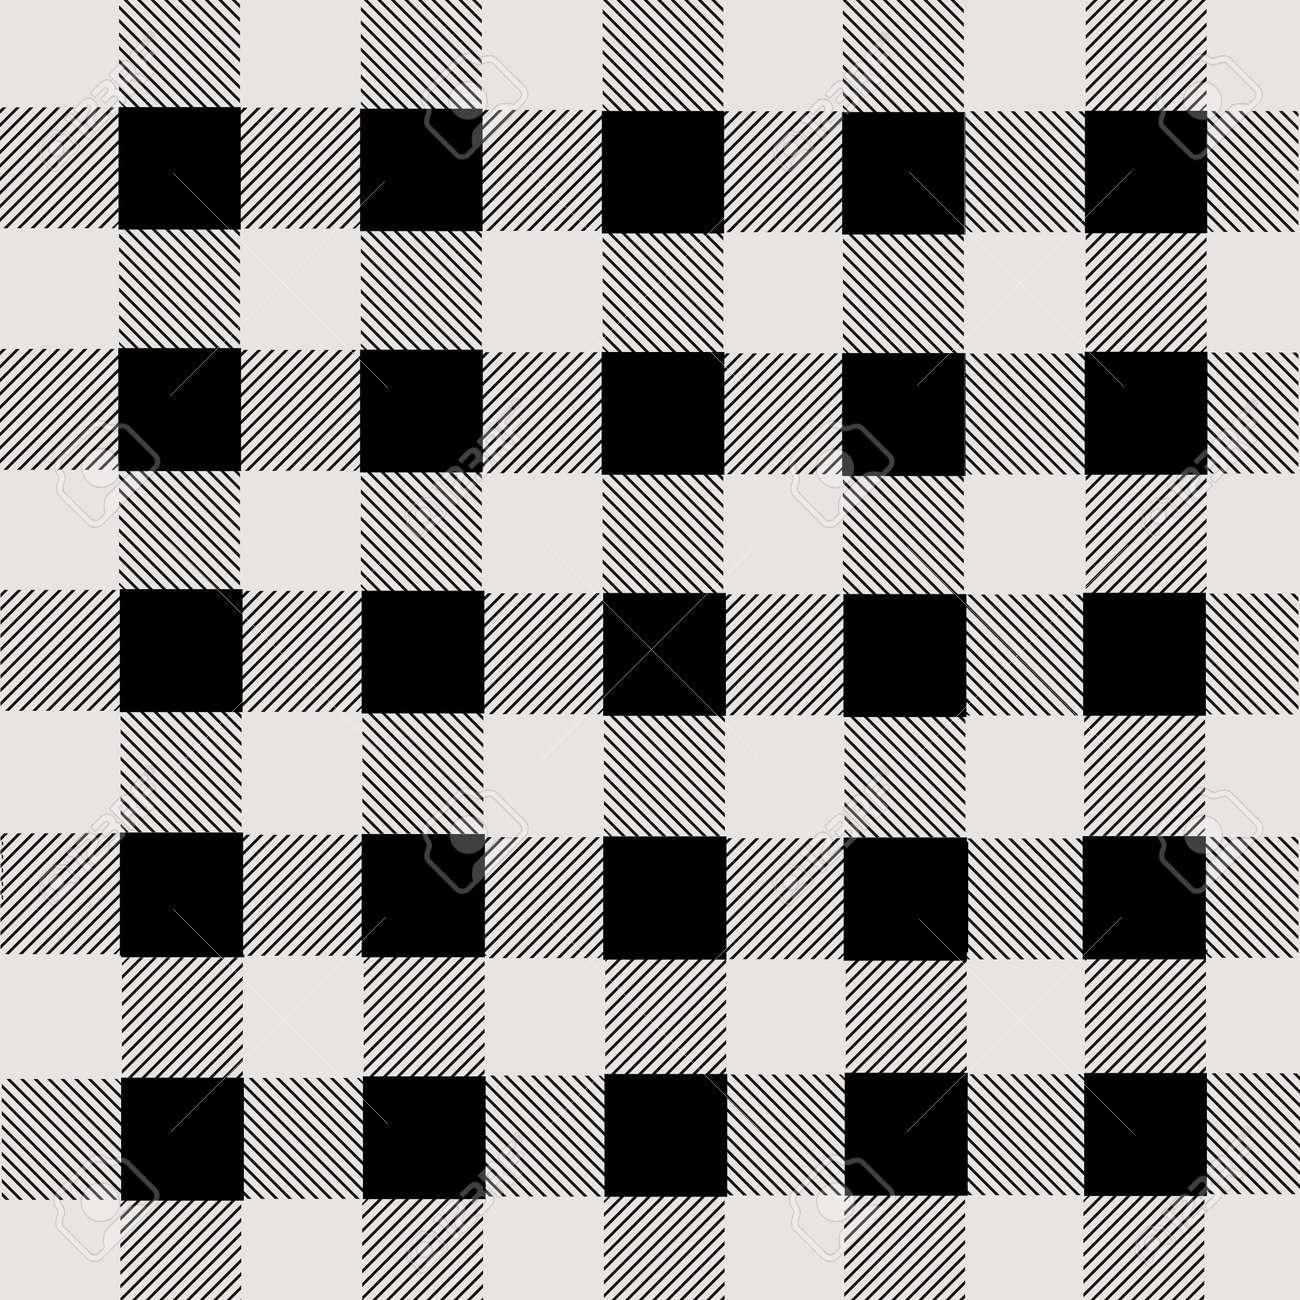 Black and white lumberjack plaid seamless pattern, vector illustration - 47616245